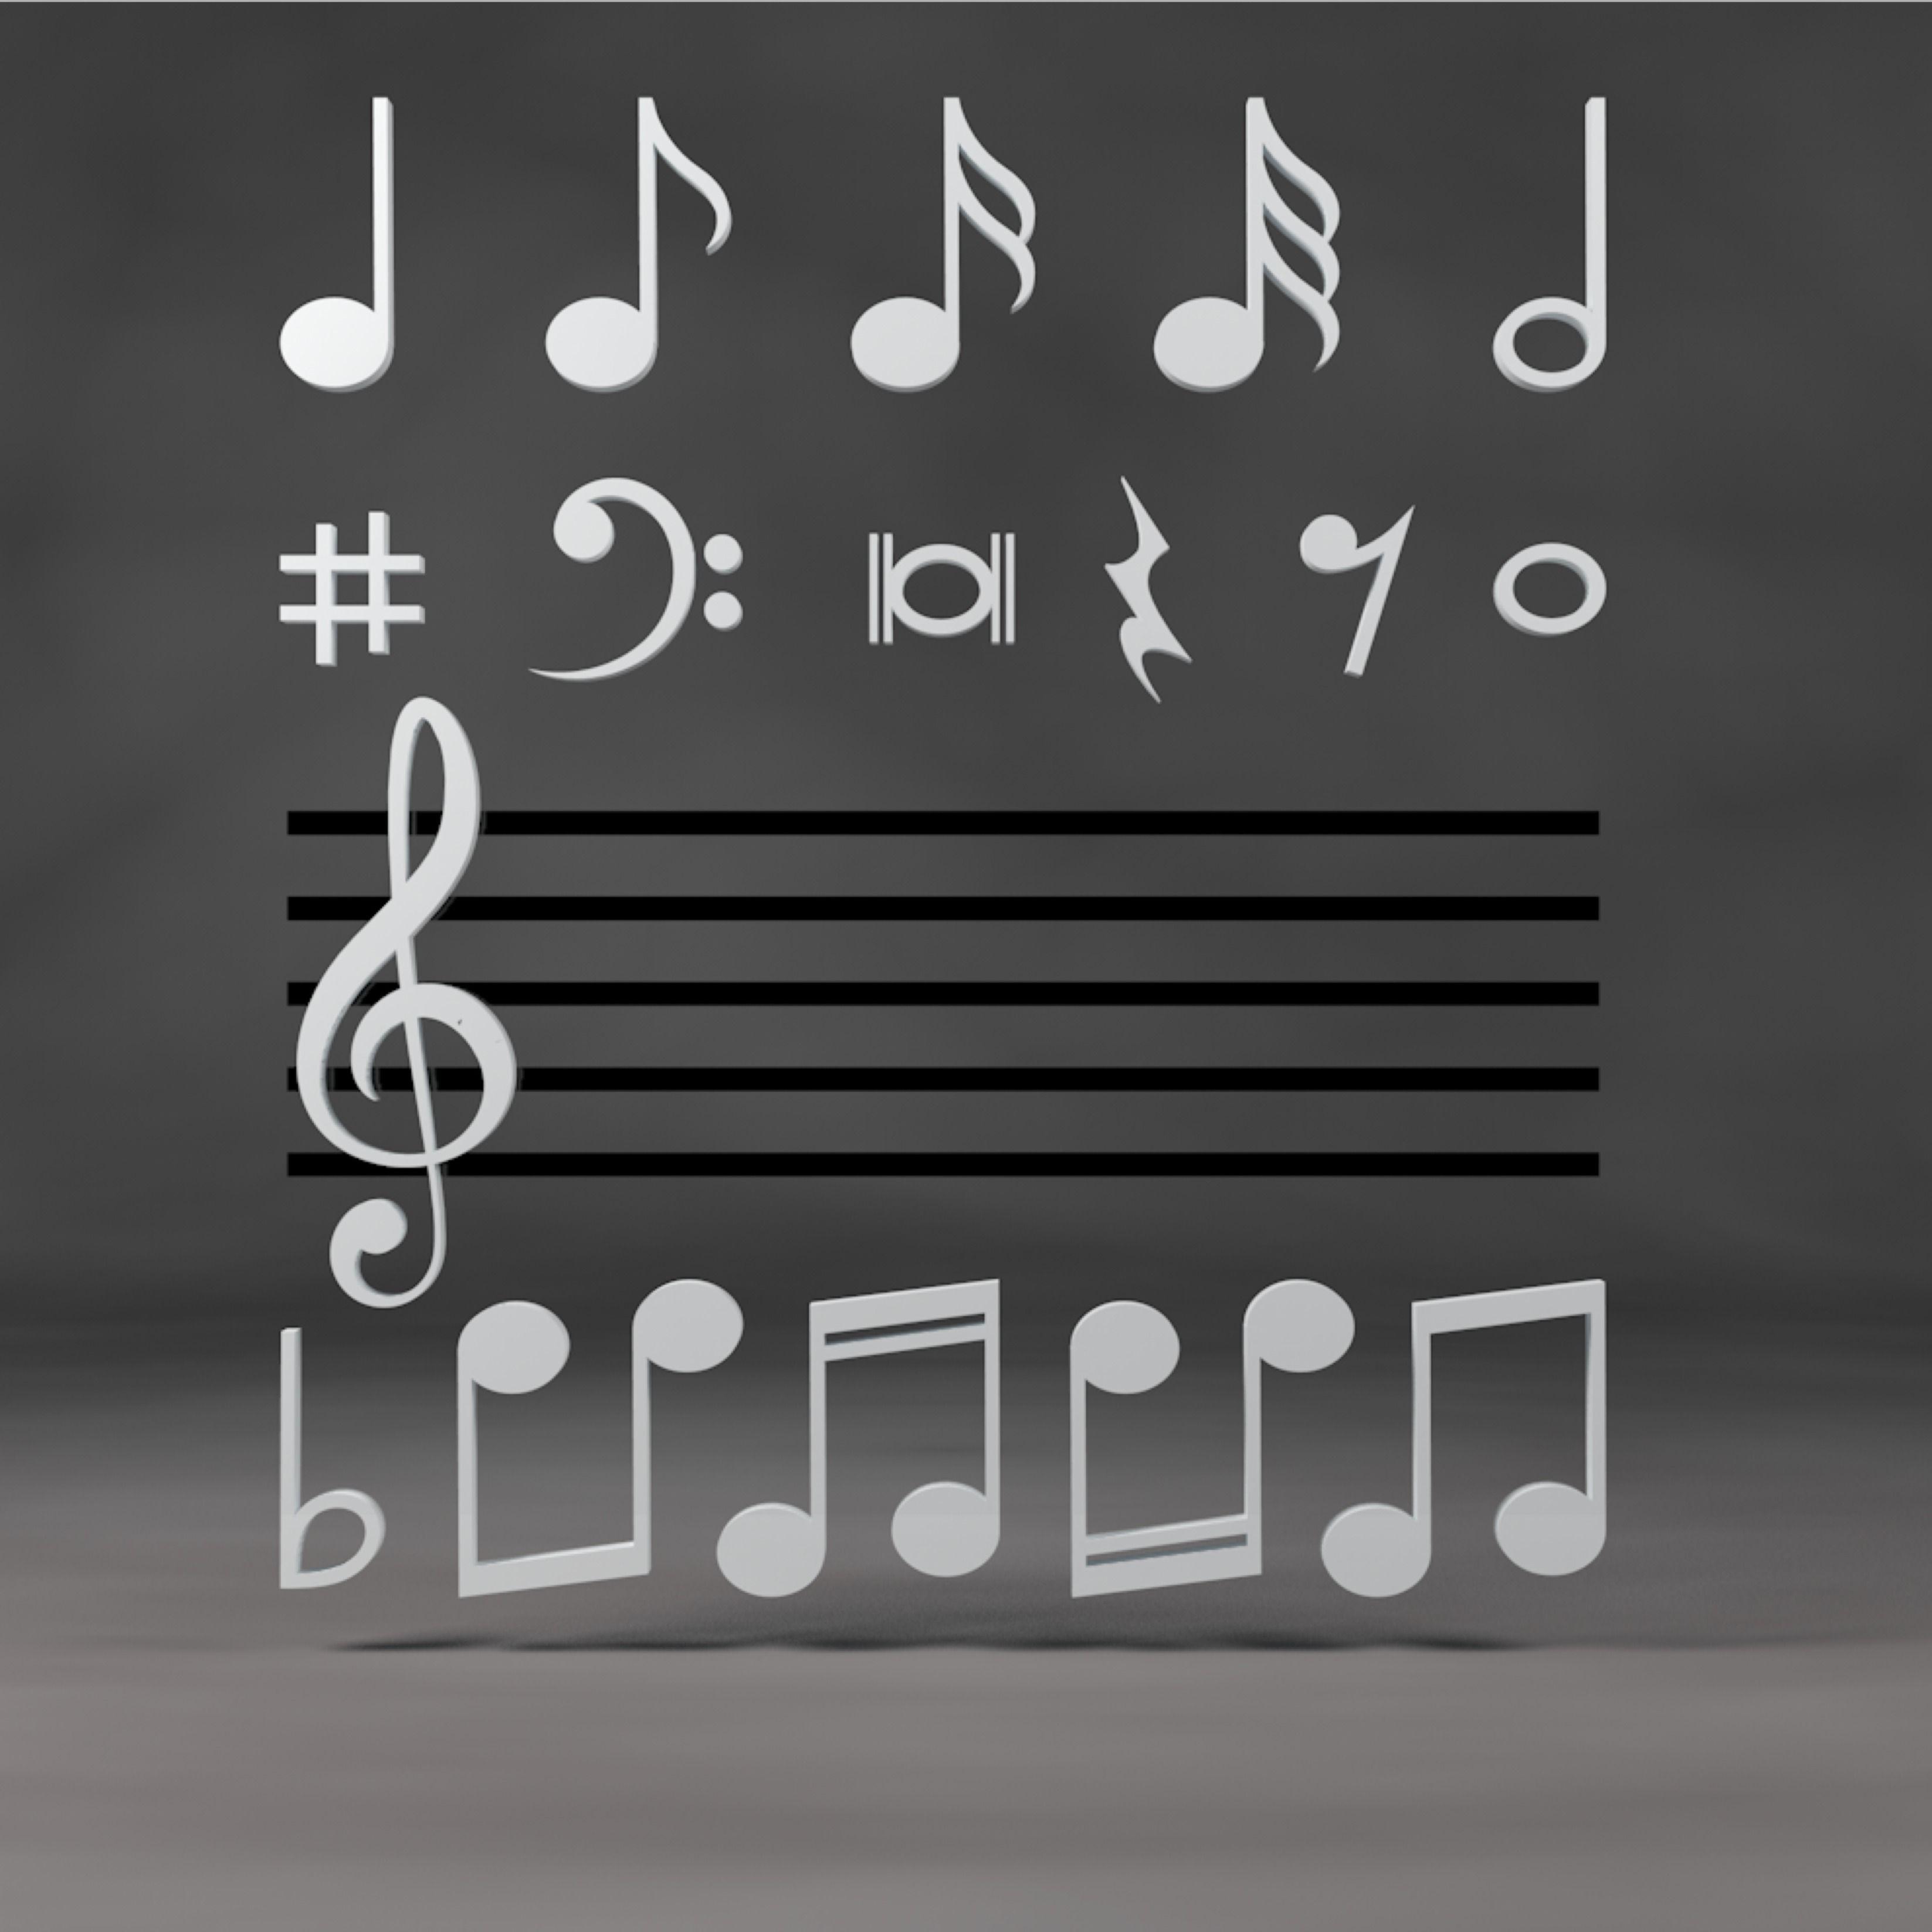 3d Music Symbols Note Pack In 2020 Music Symbols Music Notes Symbols